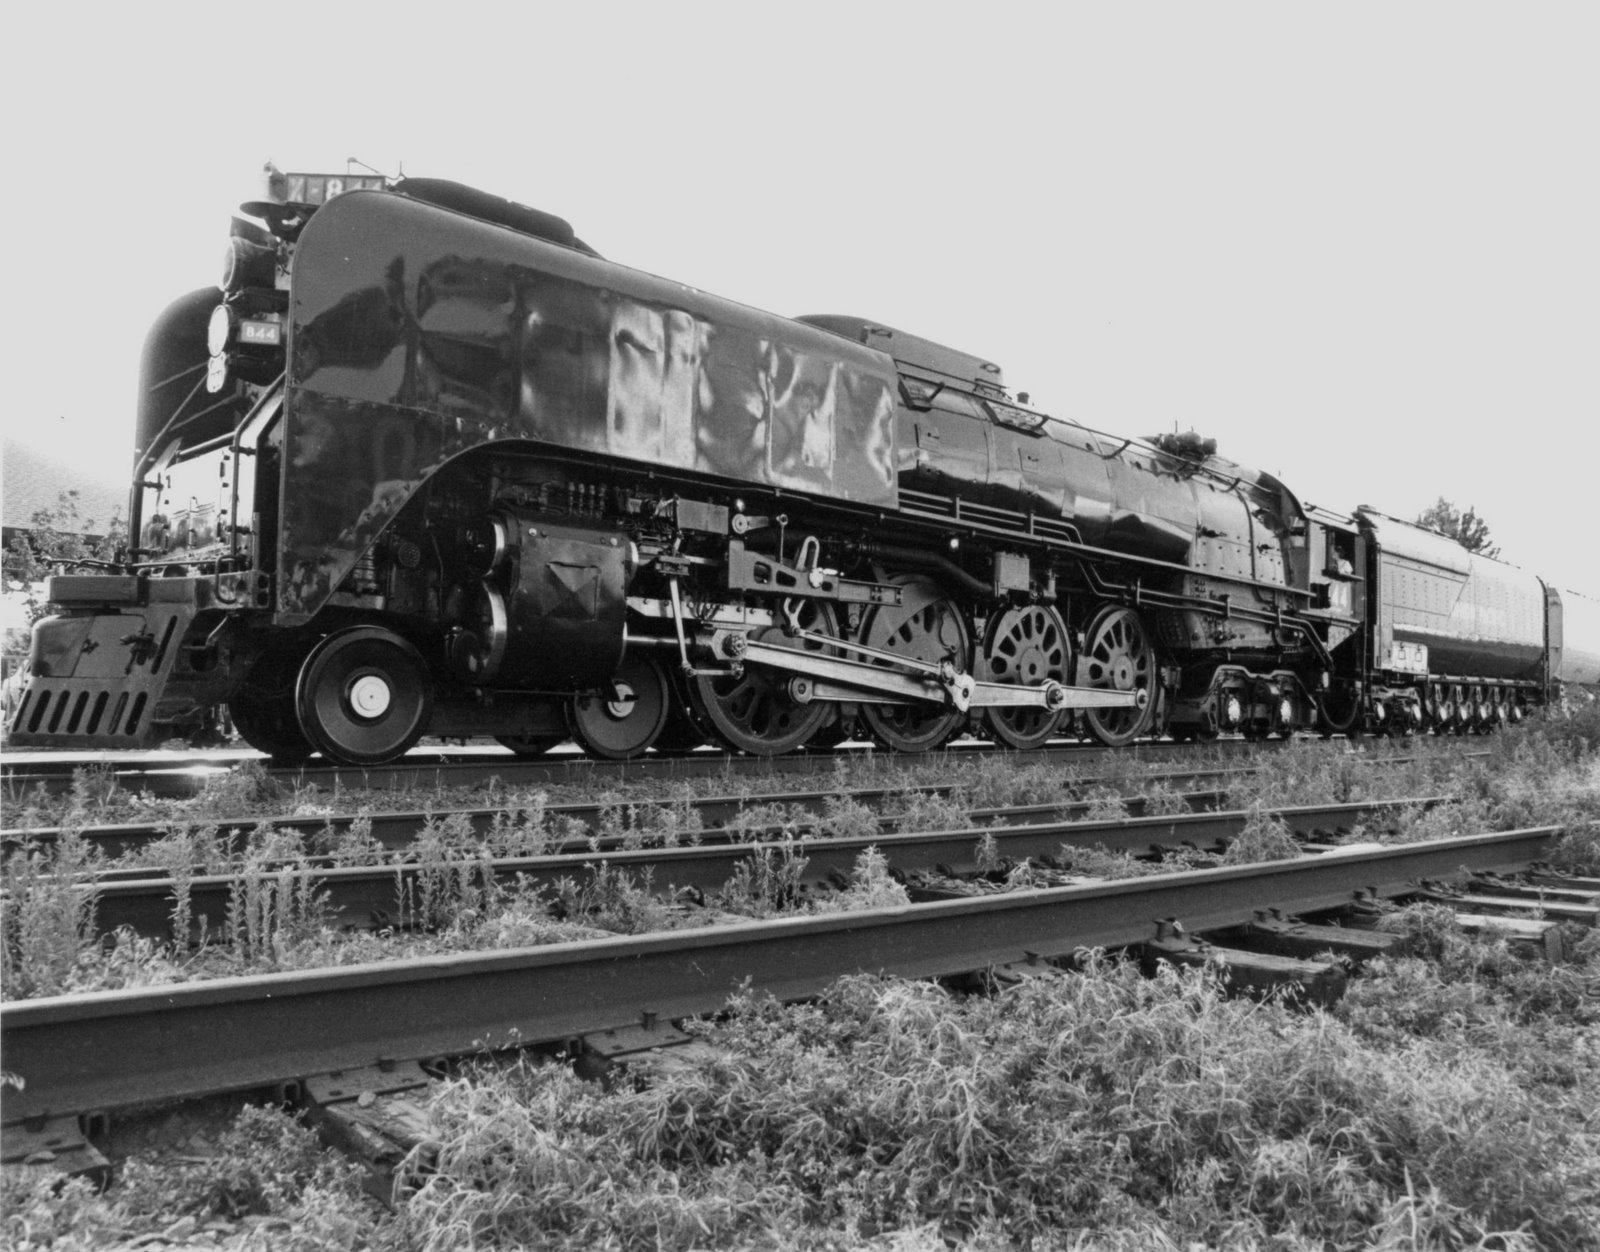 [4th+of+July+train.jpg]